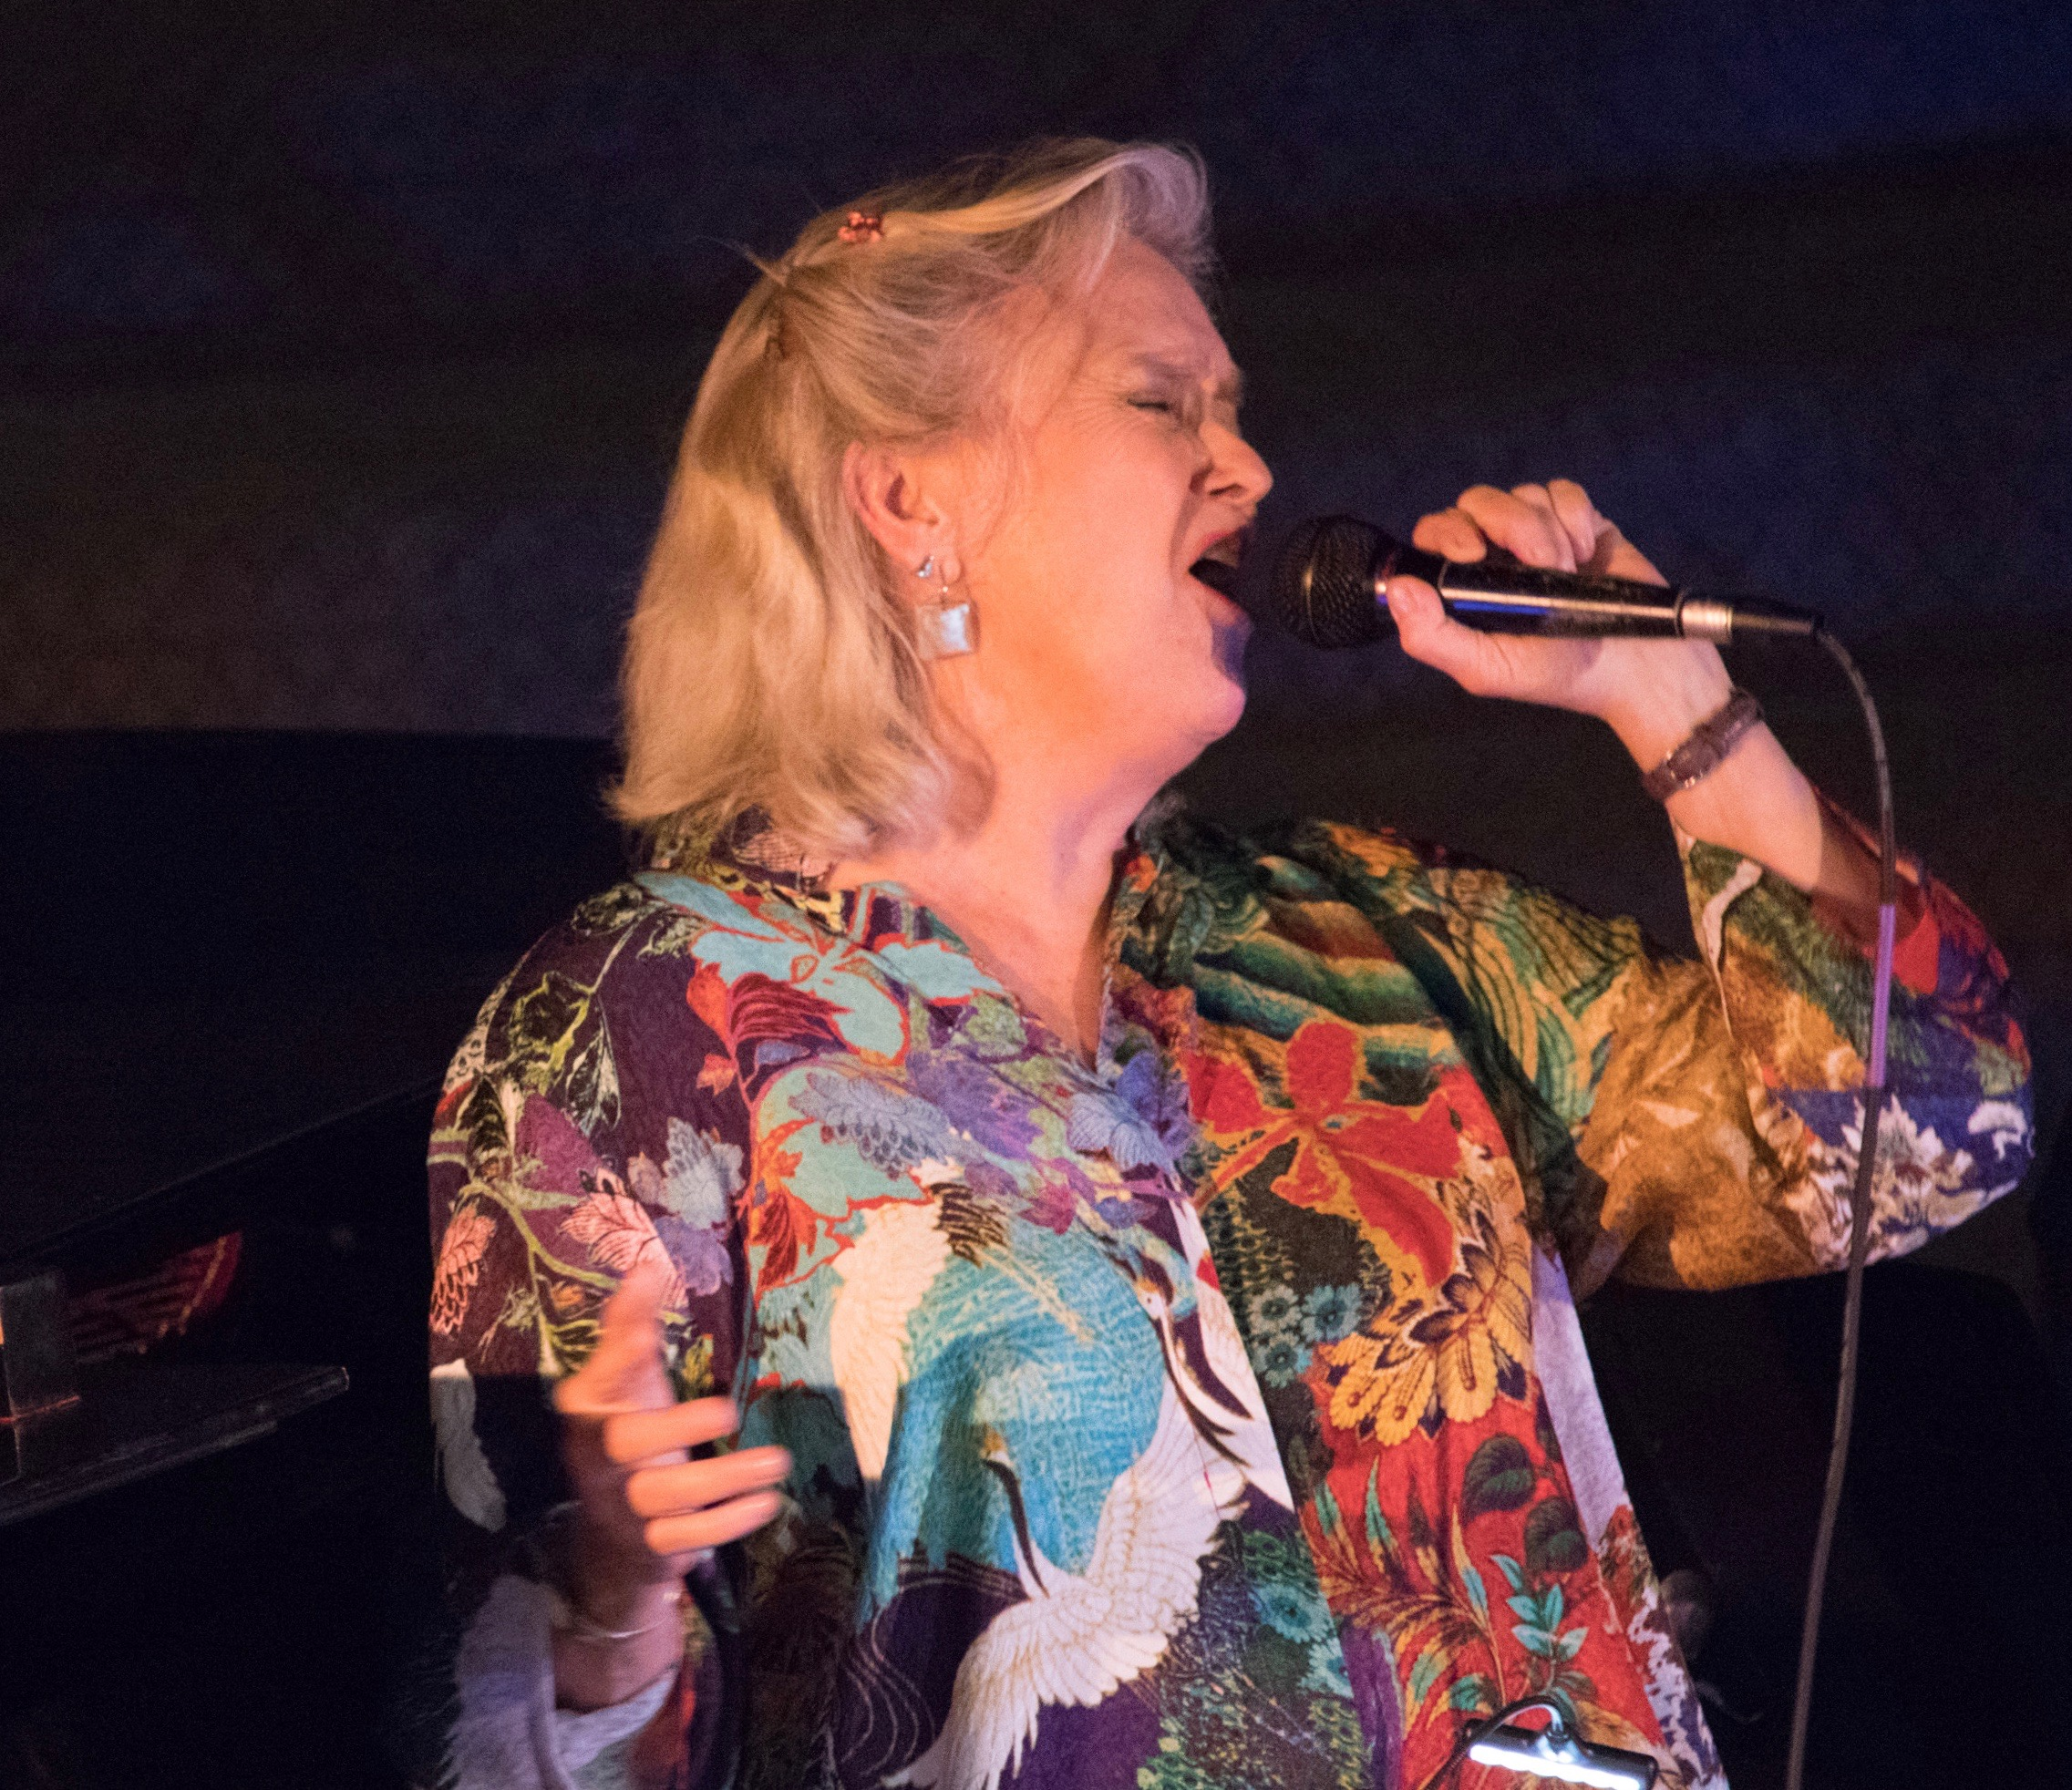 Susan Krebs @ SPRING record release